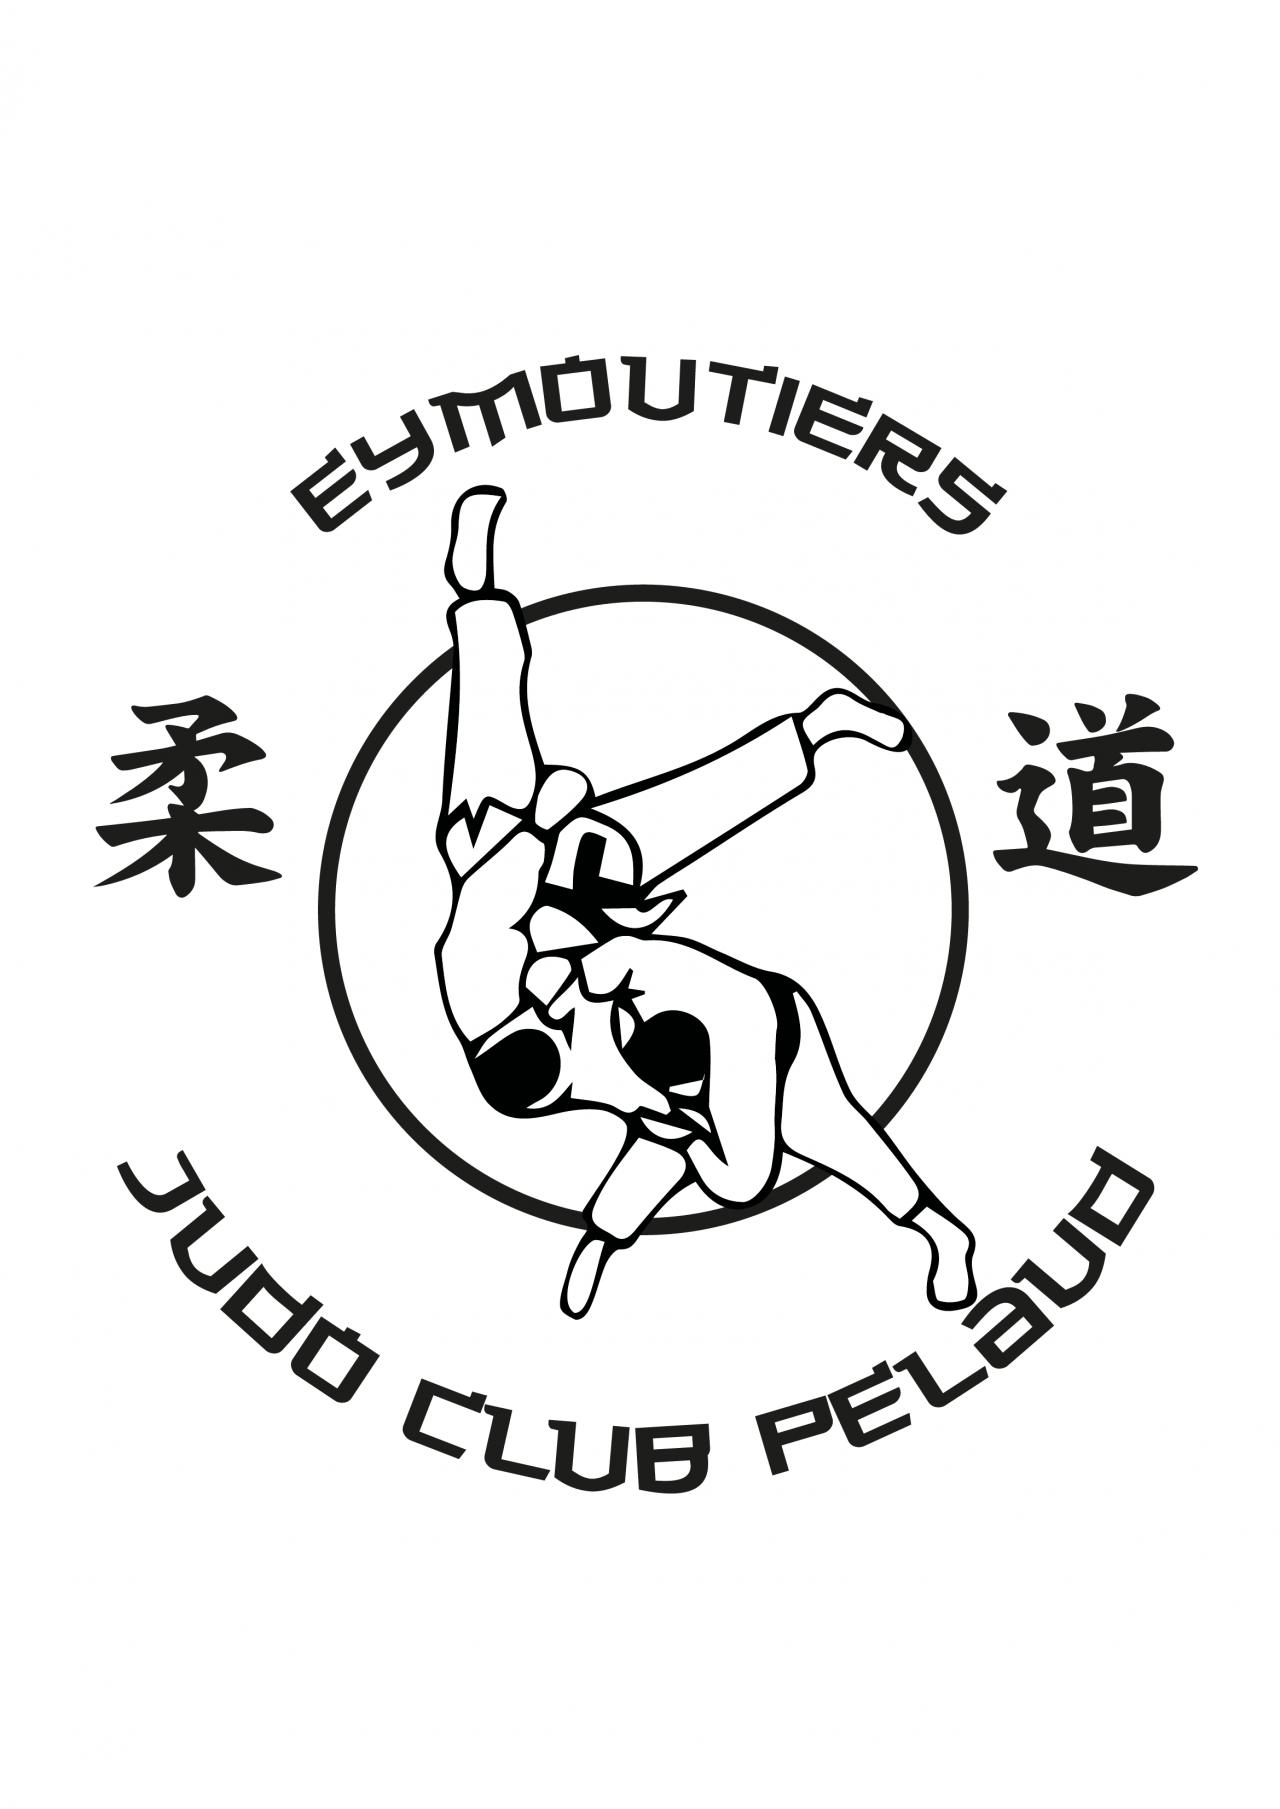 JUDO CLUB PELAUD